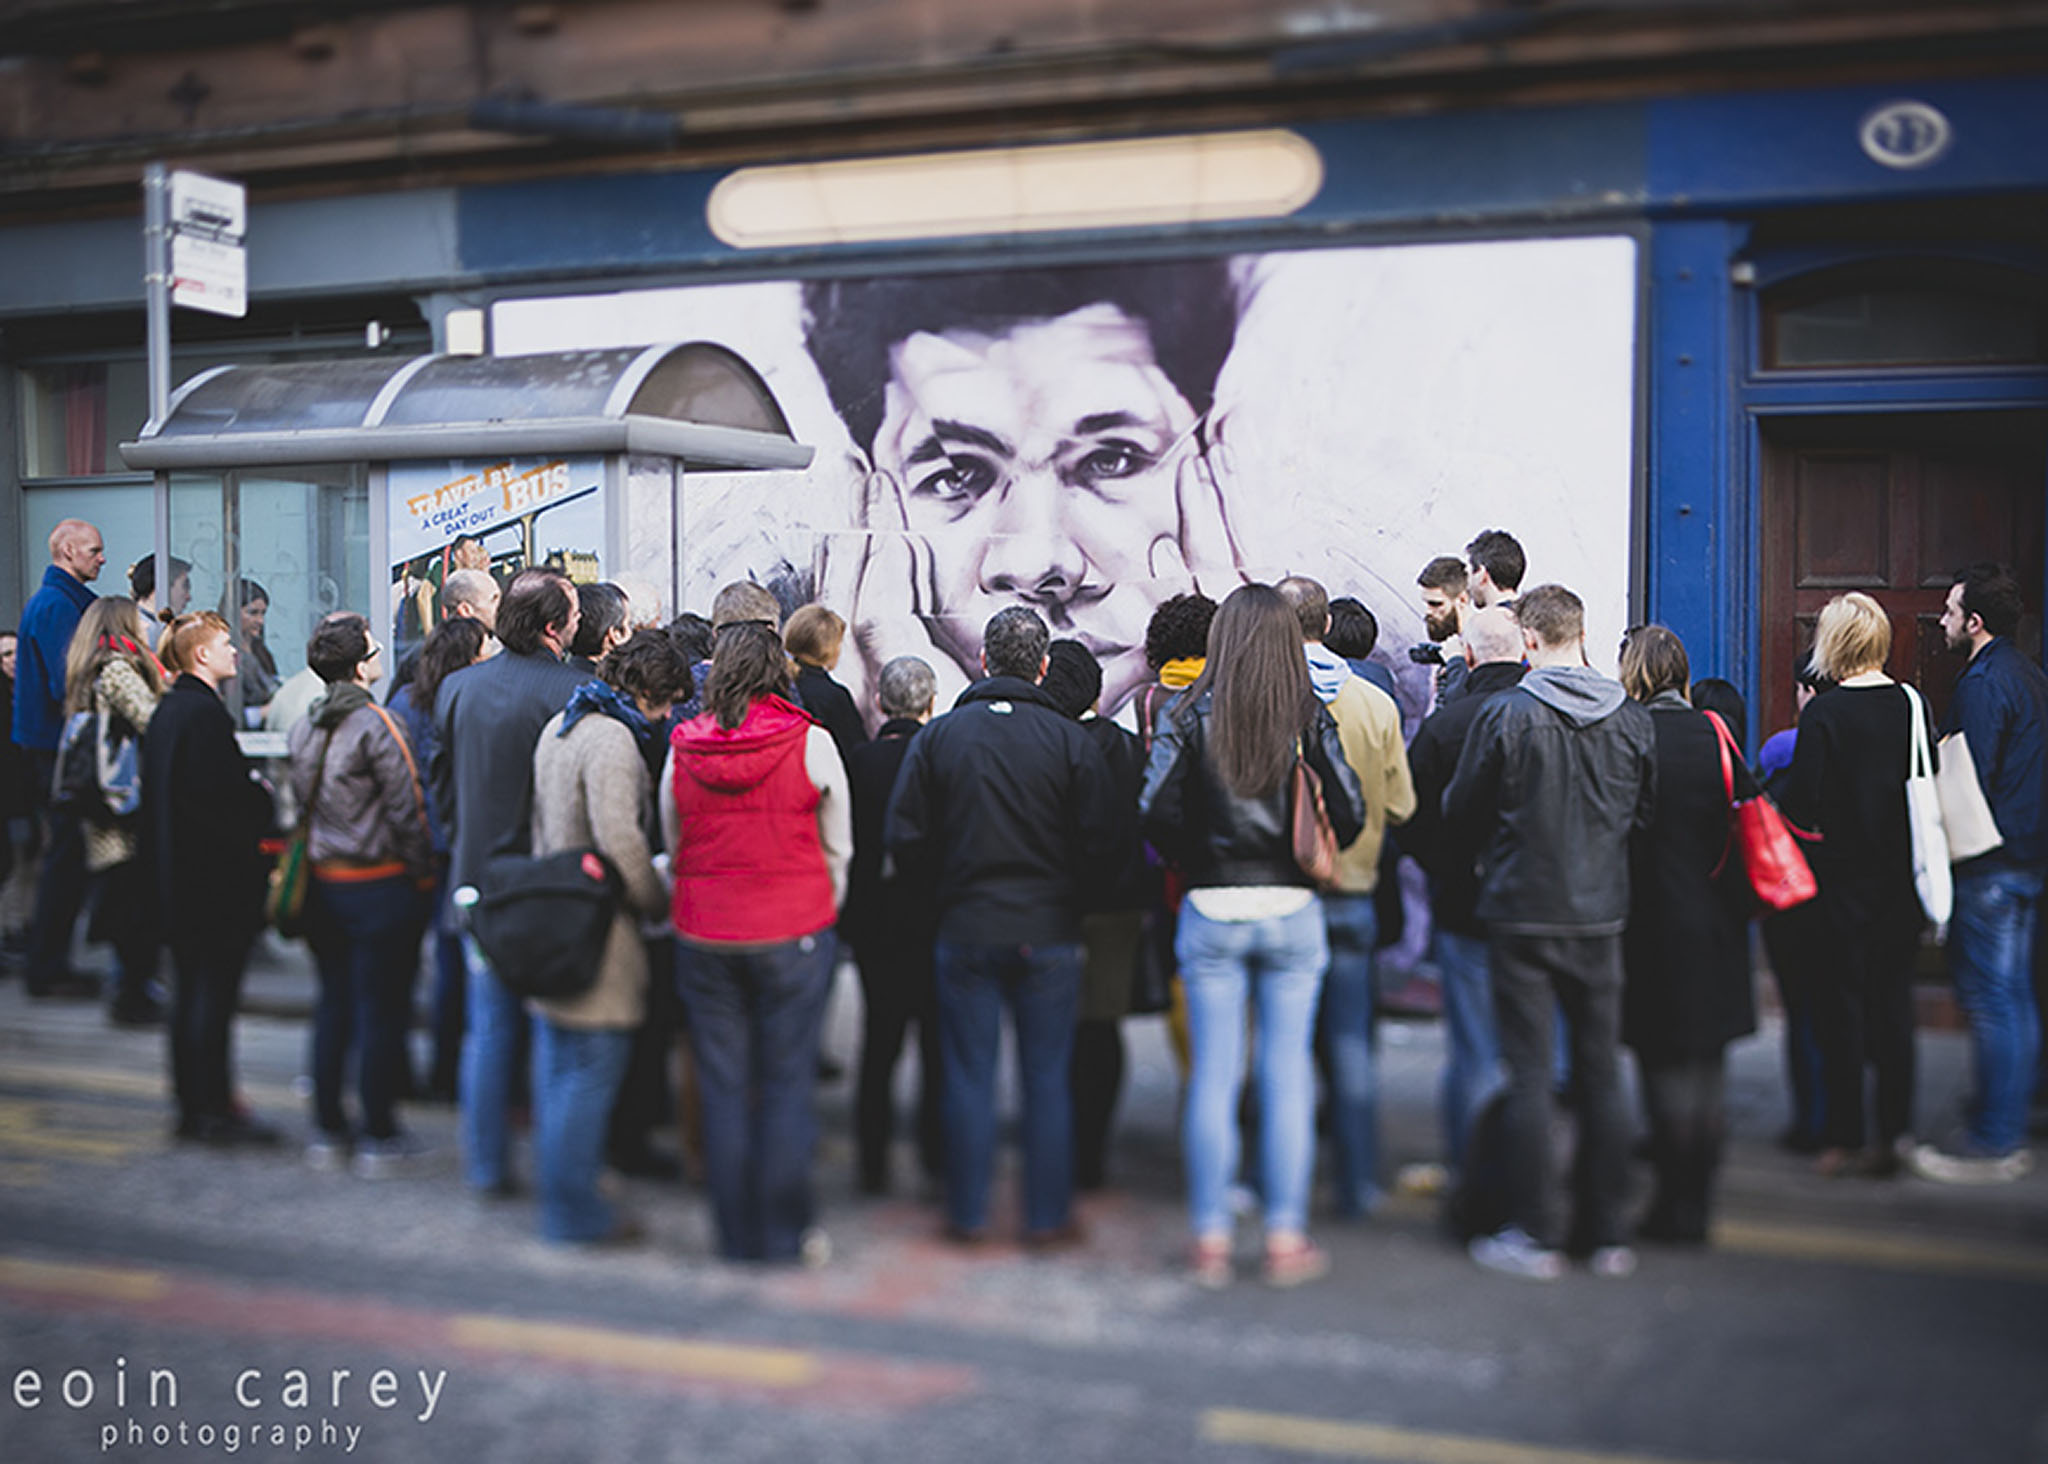 Eduardo Paolozzi, Henderson Street by Russell Dempster